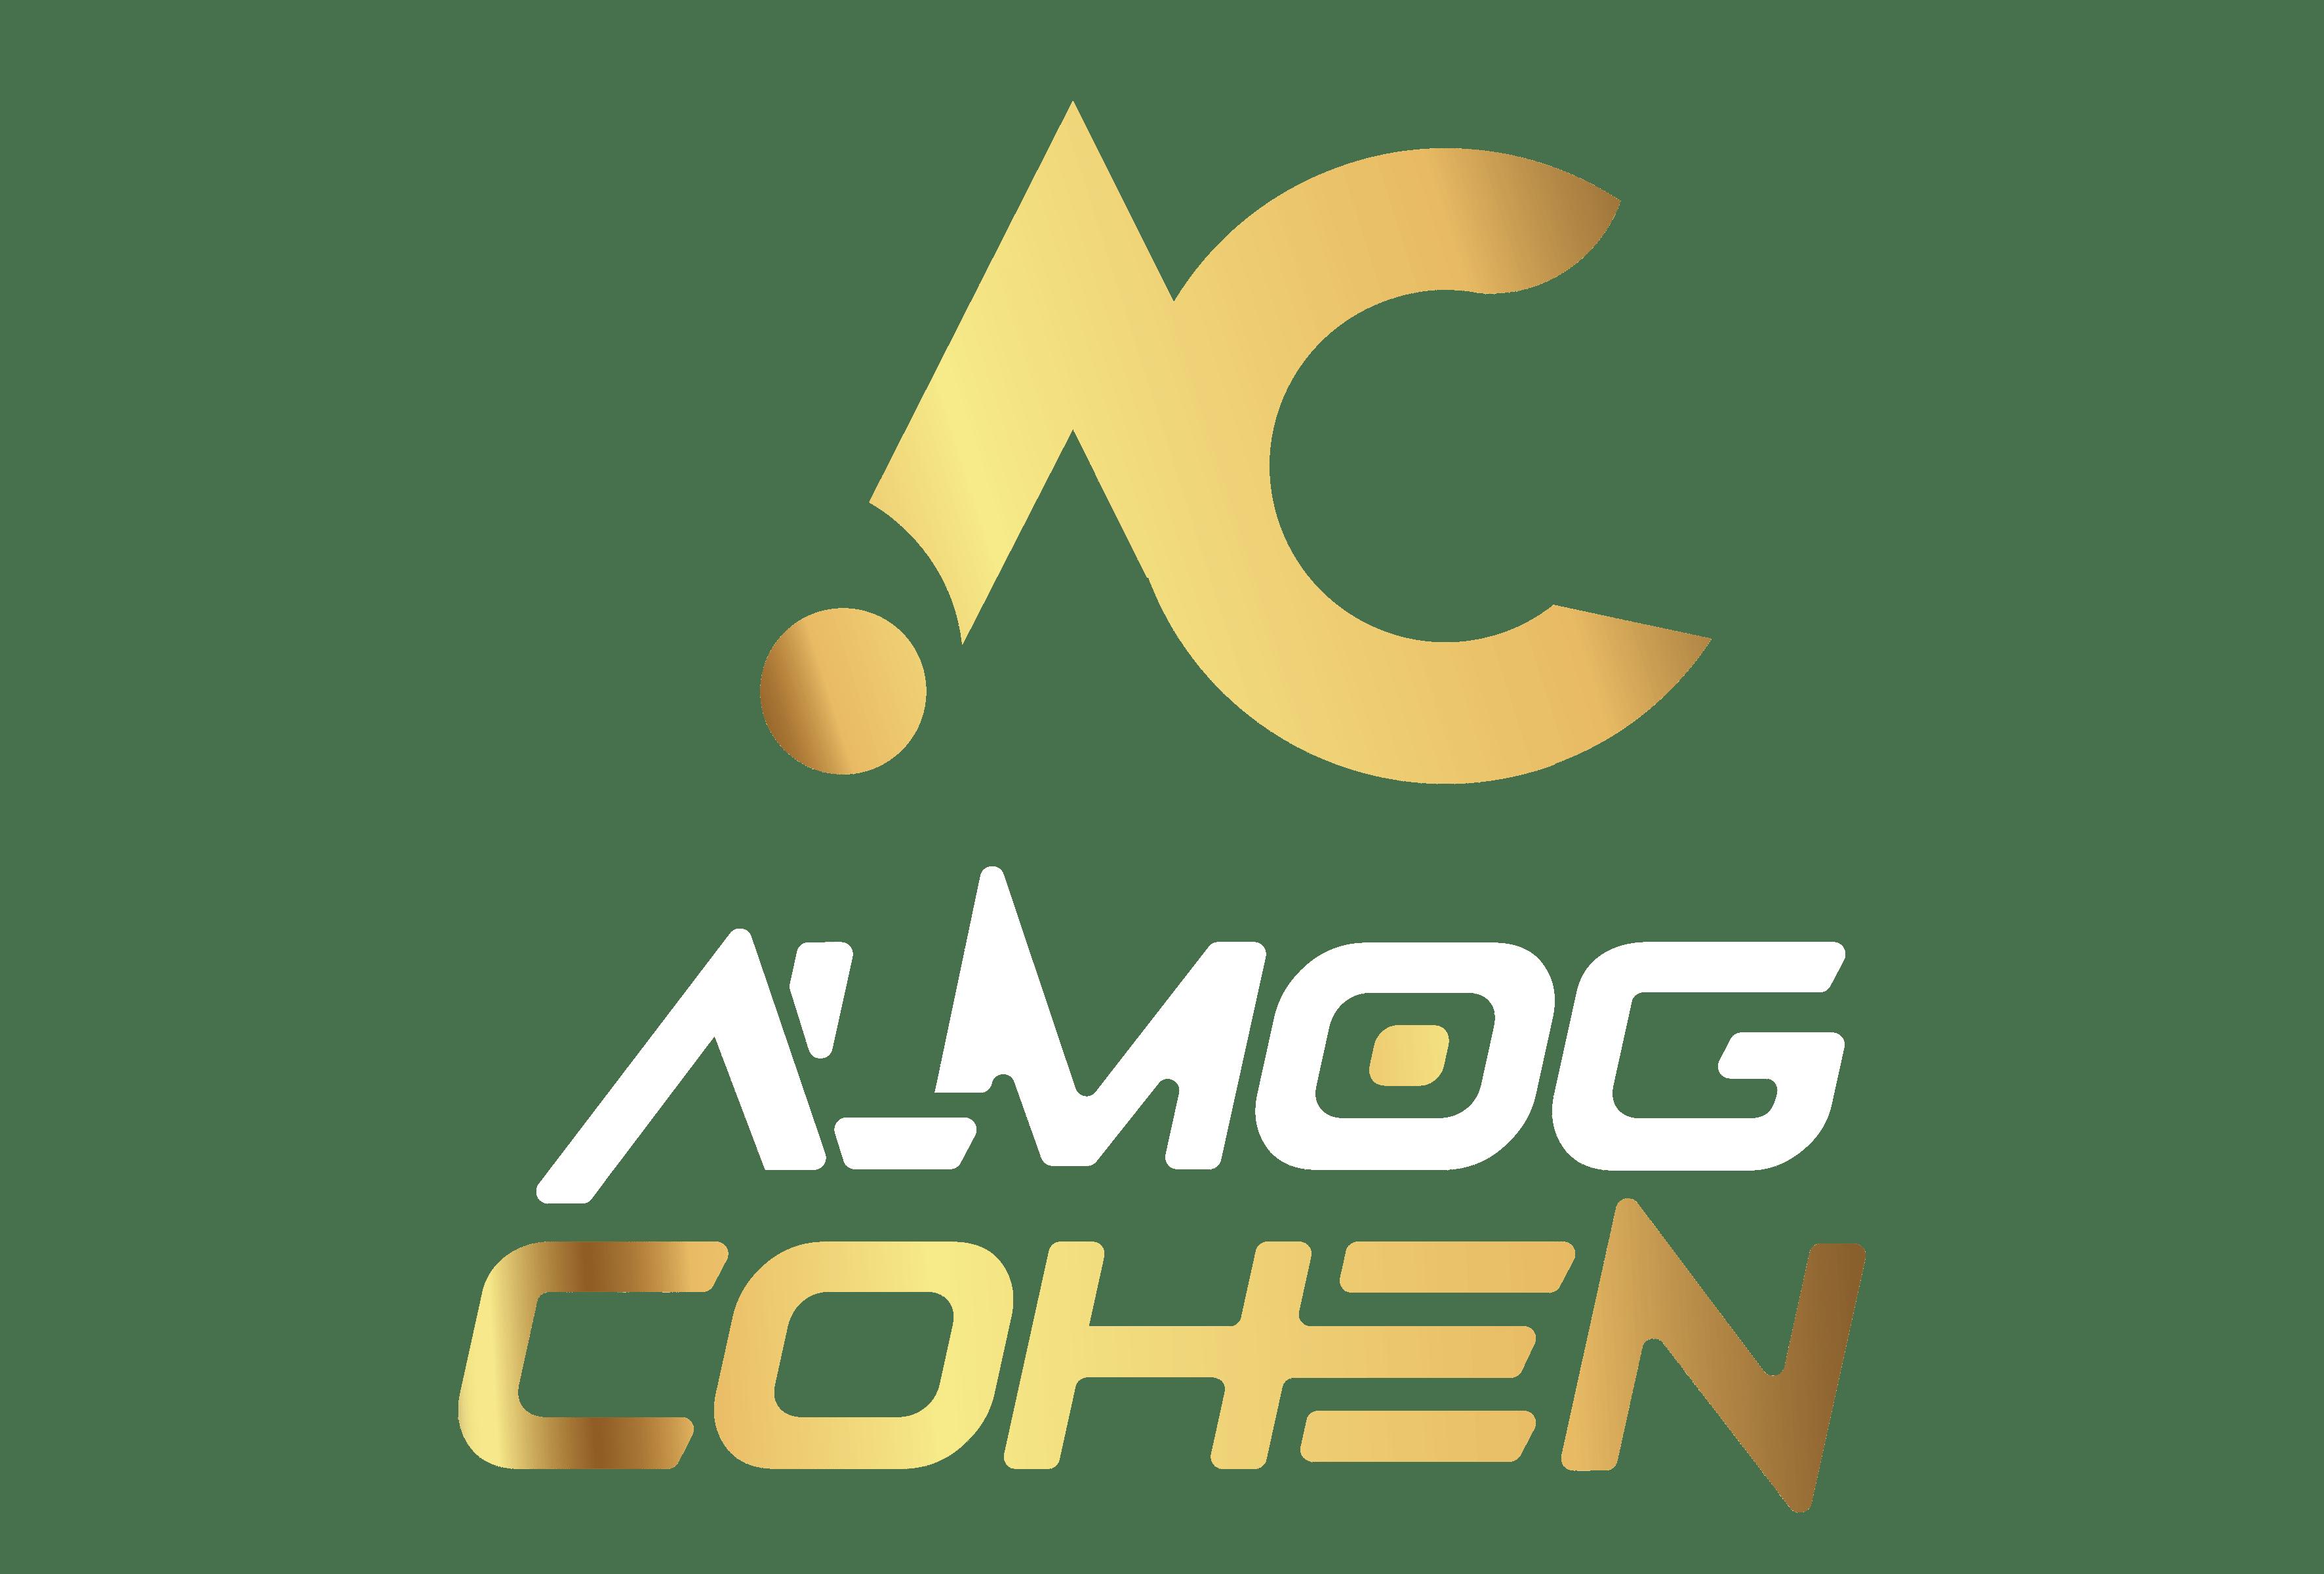 DJ ALMOG COHEN